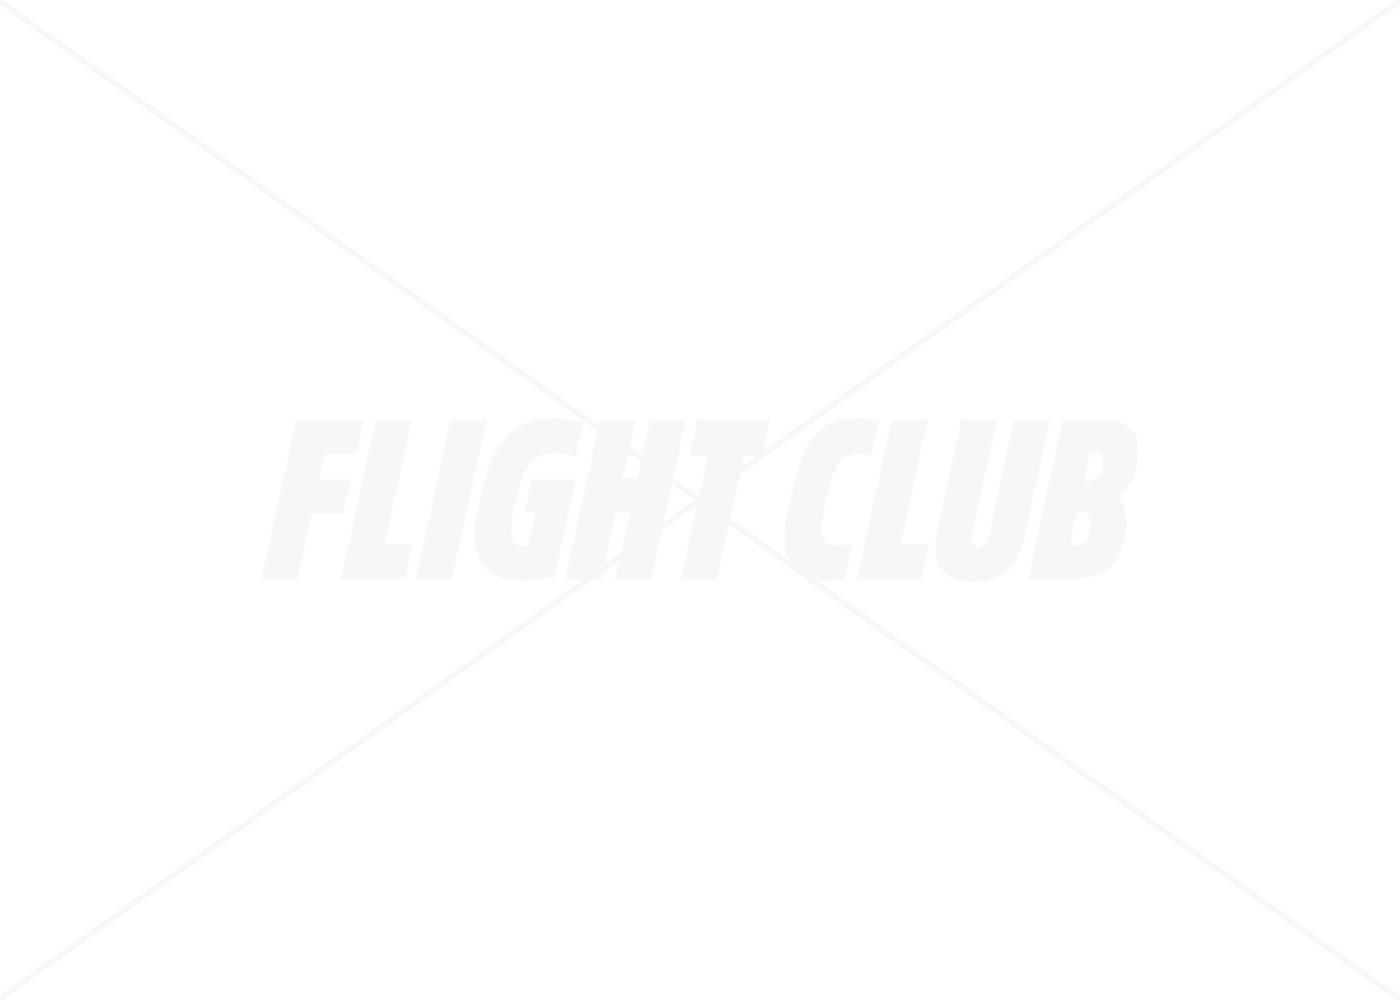 Air Jordan 1 Retro High Air Jordan 332550 800 max orange black Flight Club